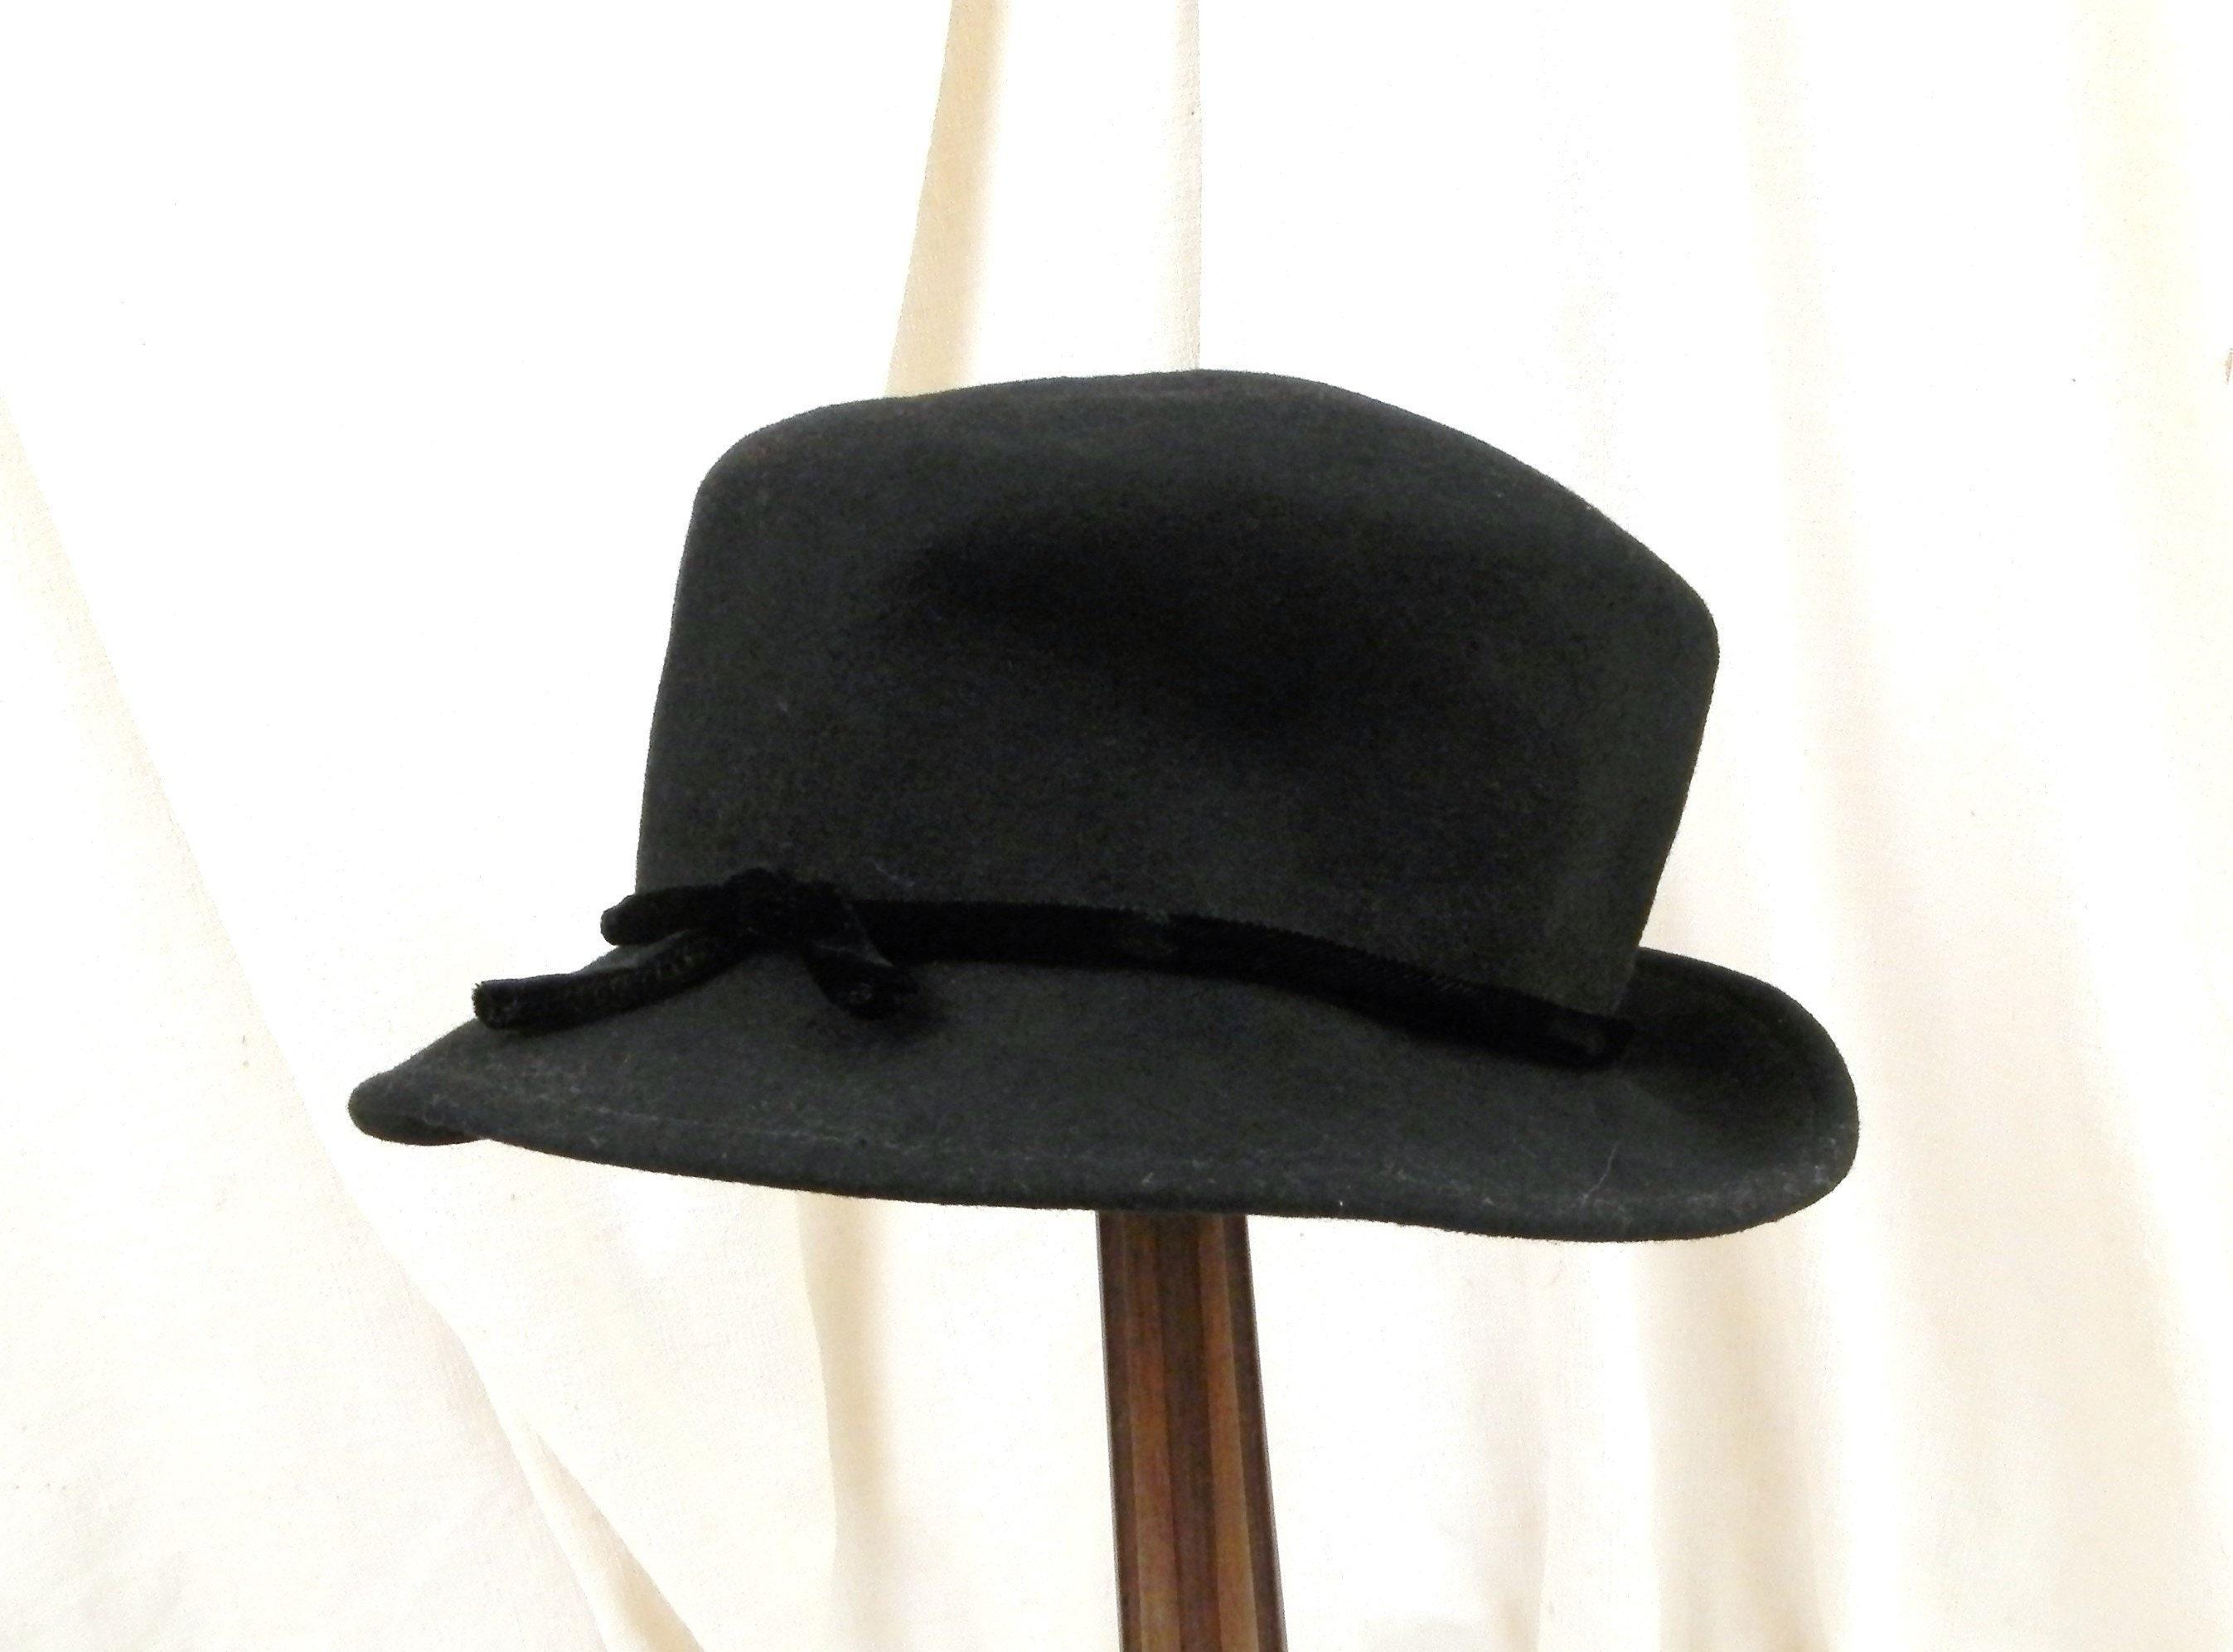 d5bb4d877b39f Vintage French Black Felt Cloche Hat with Satin Ribbon